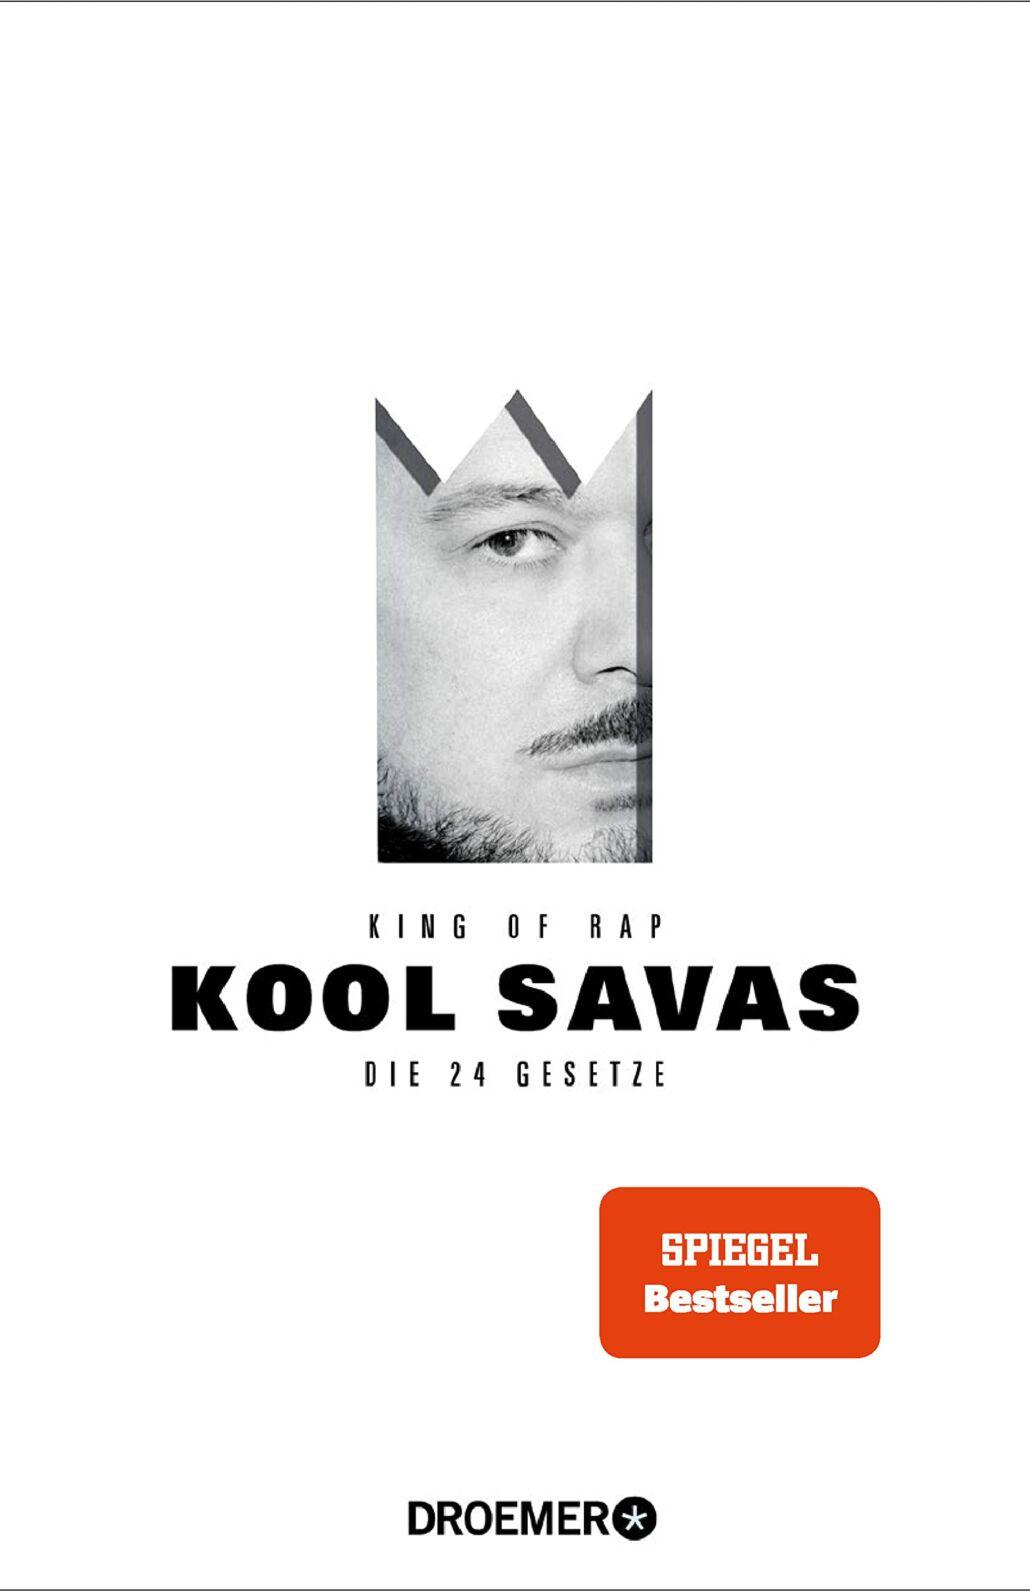 Kool Savas – The Godfather of Deutschrap